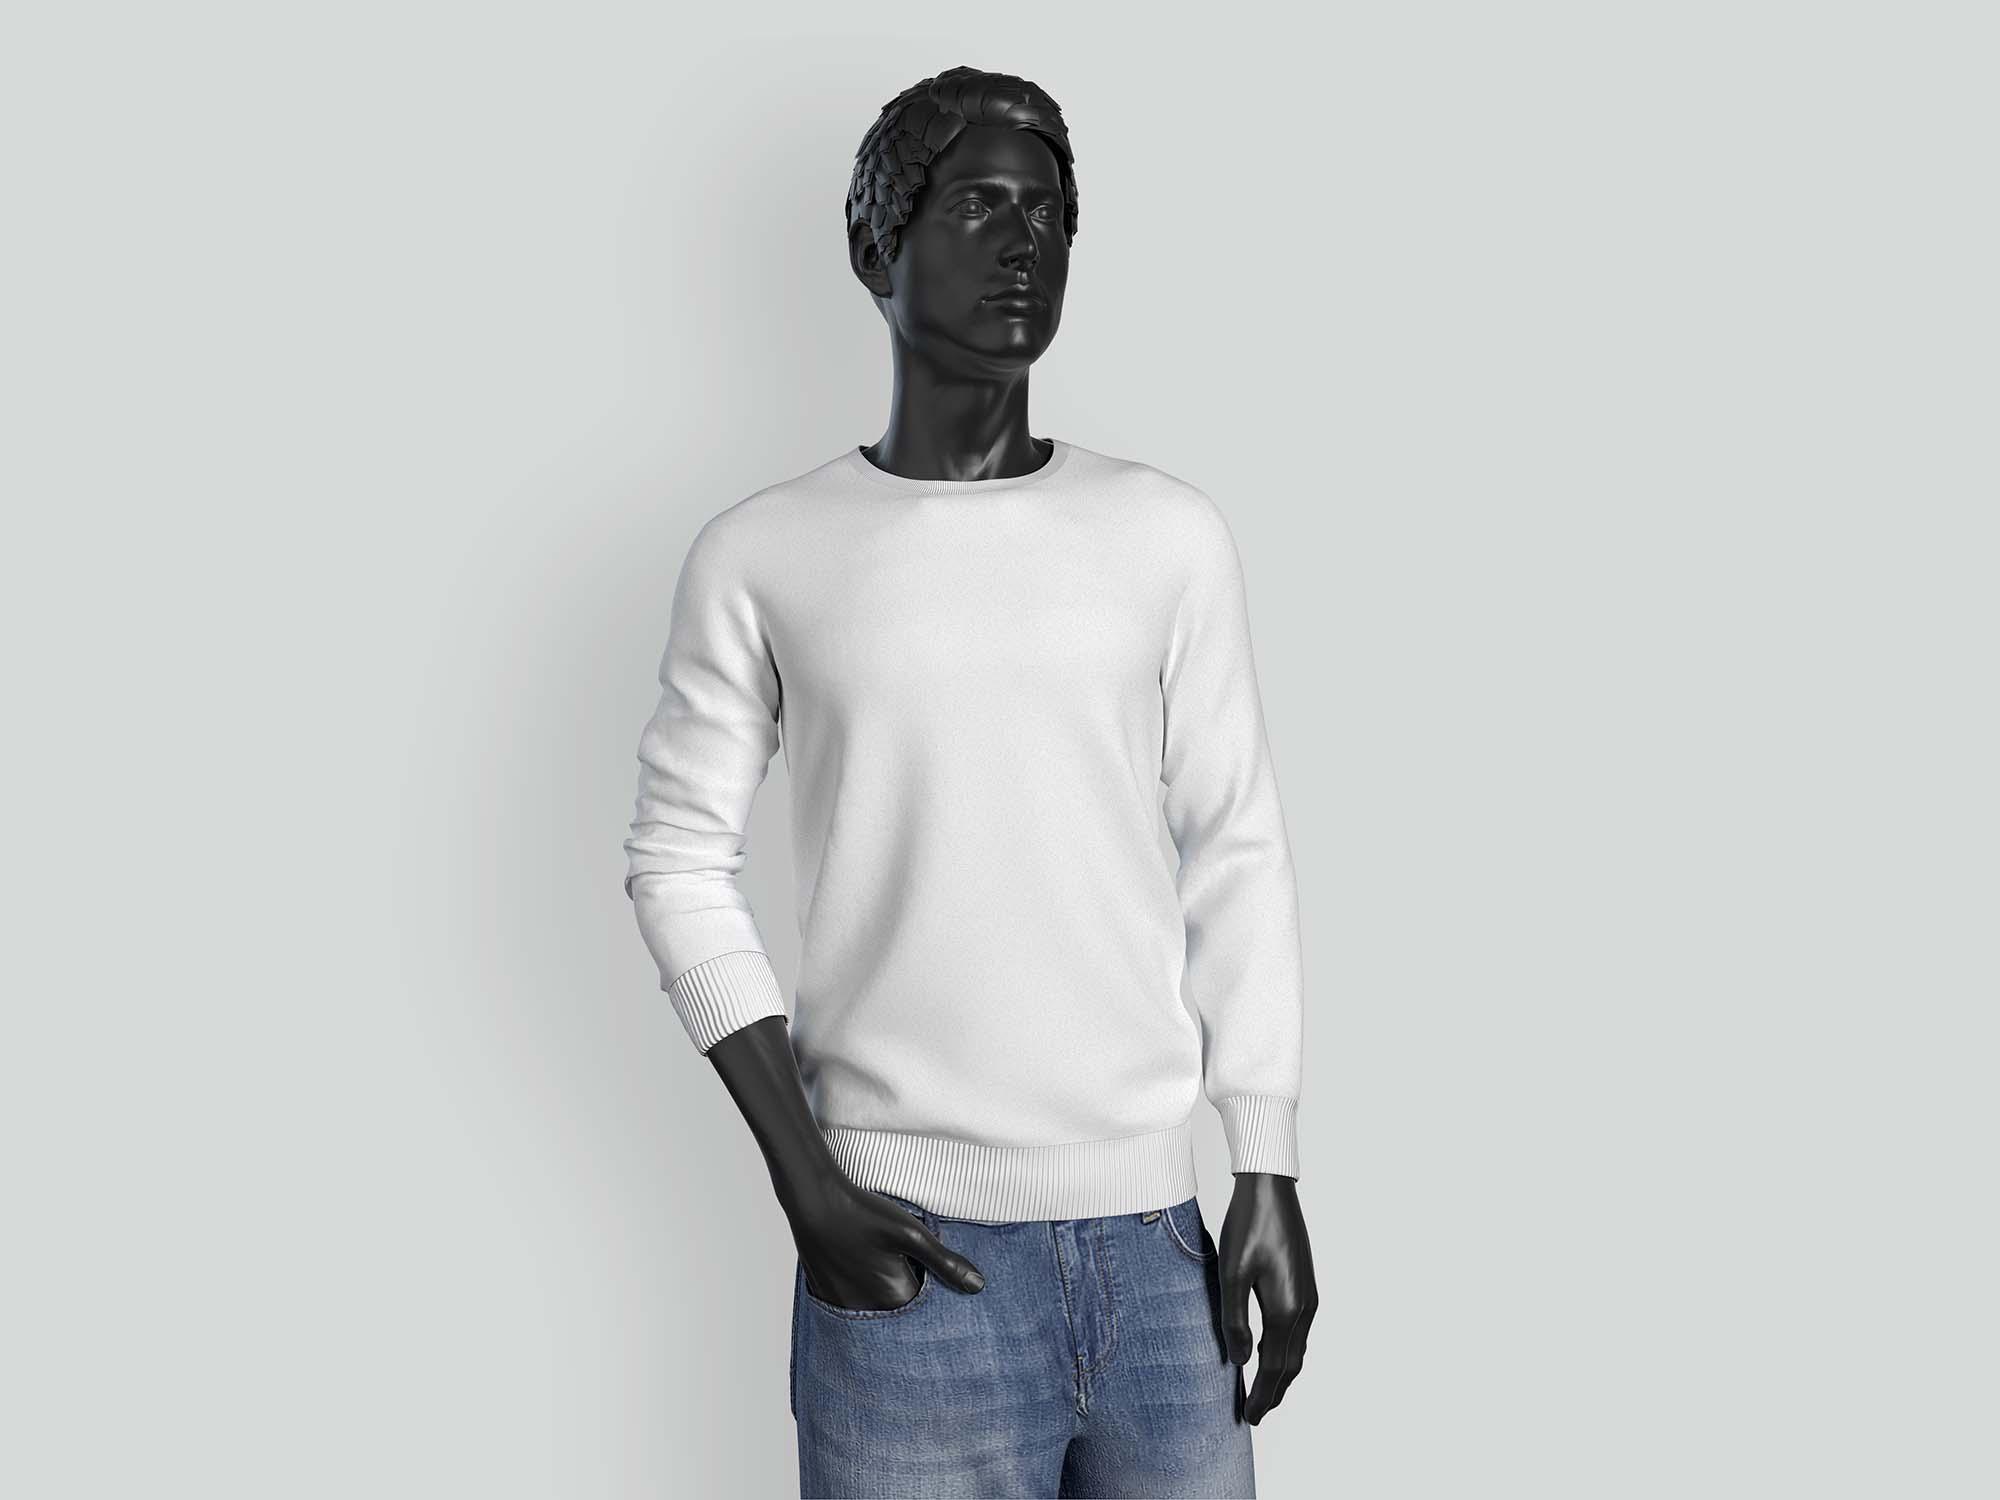 Long Sleeve Men T-shirt Mockup